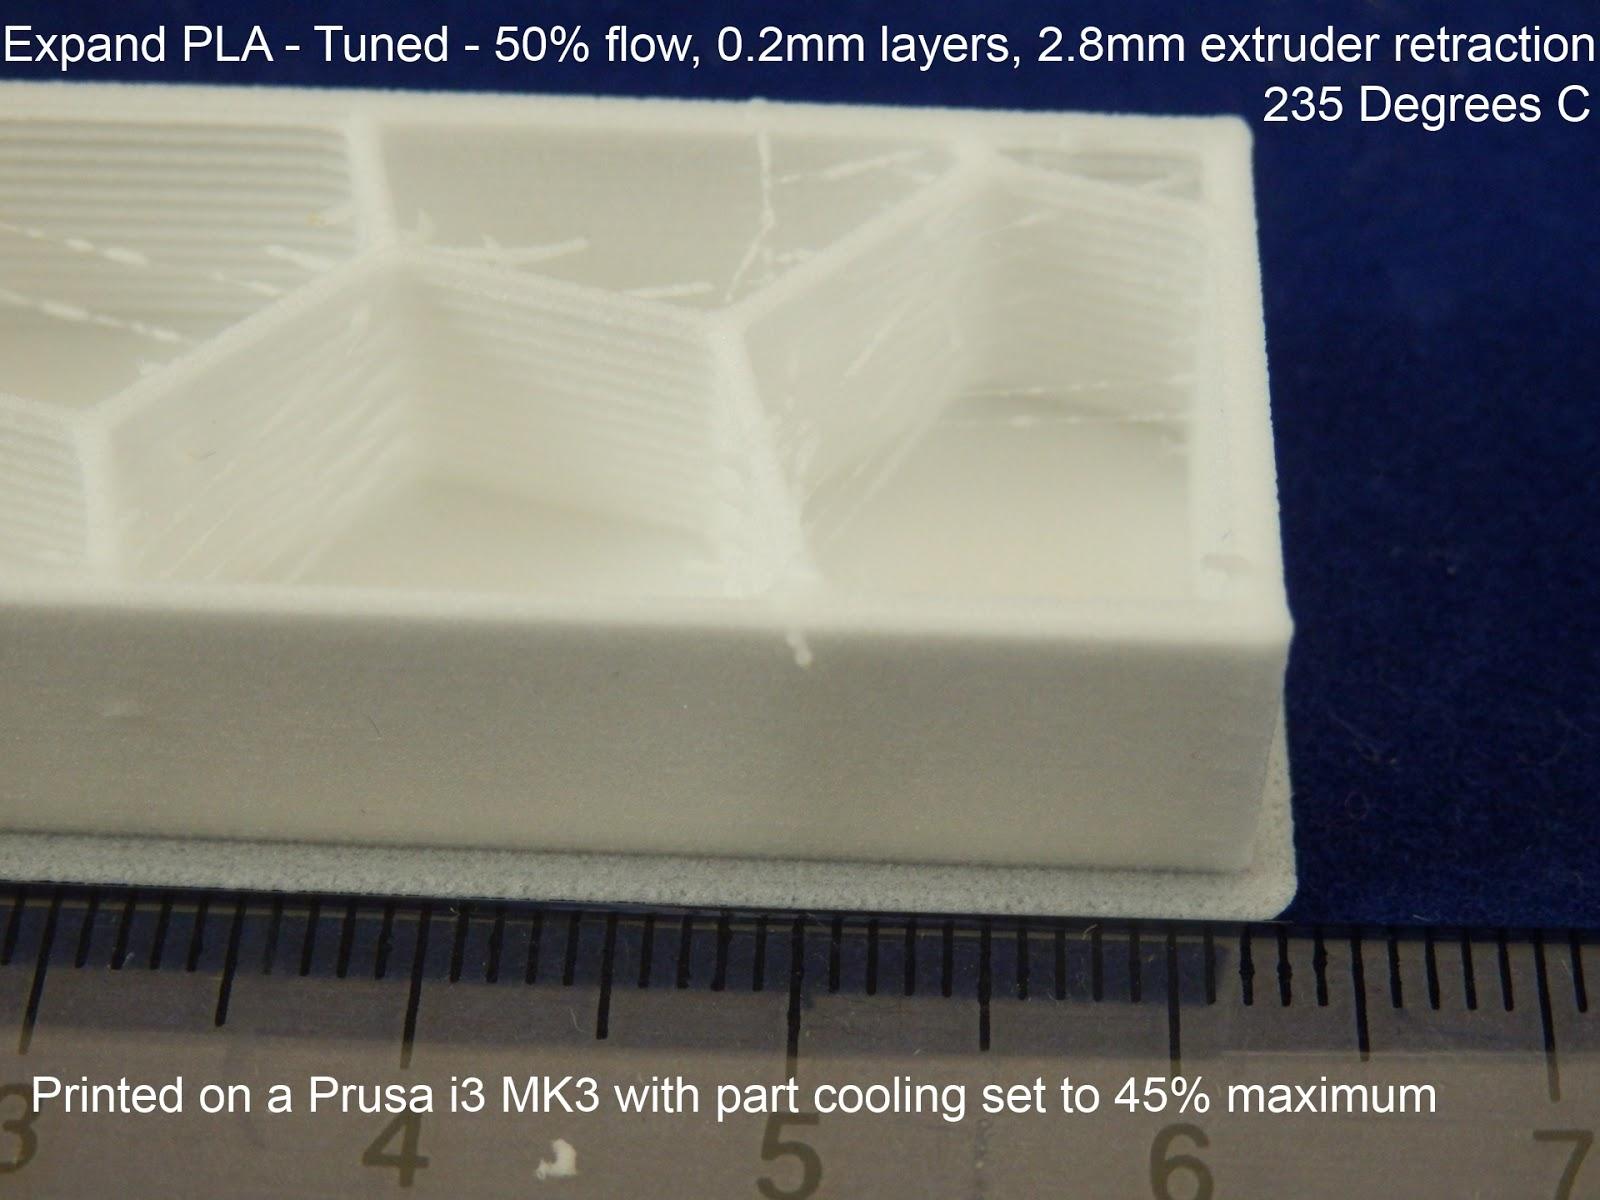 Reprap development and further adventures in DIY 3D printing